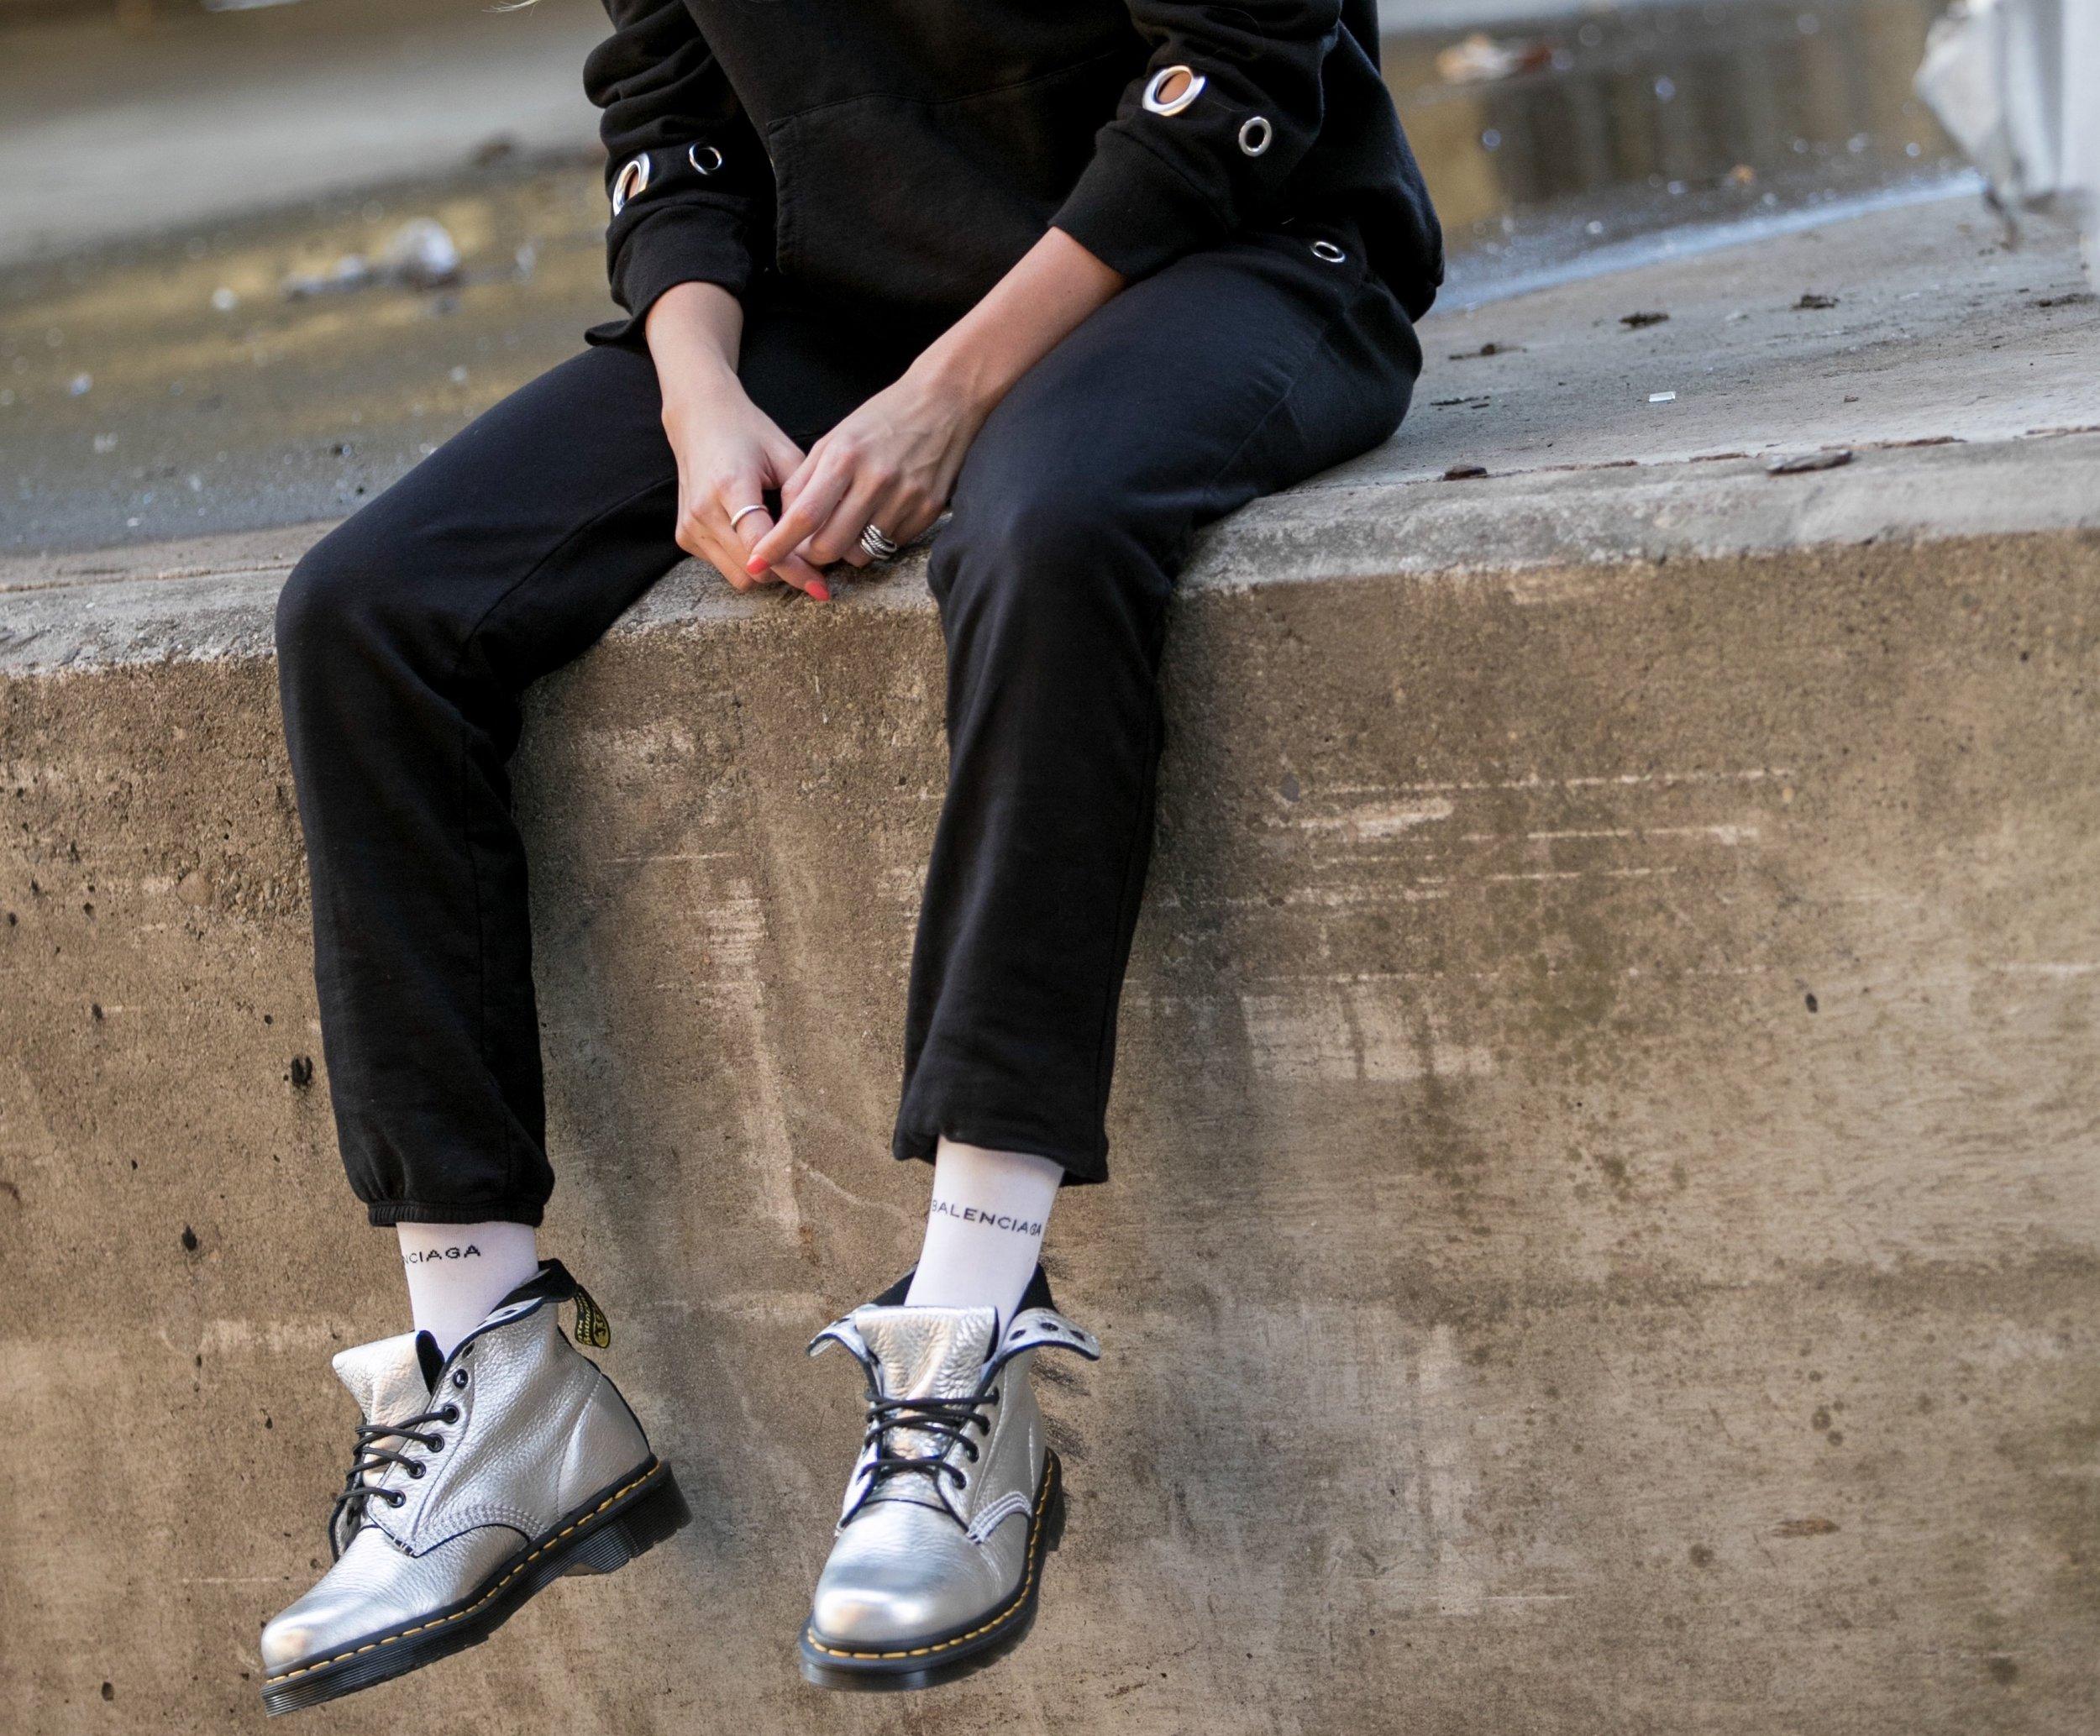 Hoody: Monrow |Sweatpants: Monrow |Socks: Balenciaga |Boots: Dr. Marten's     Dino Petrocelli Photography